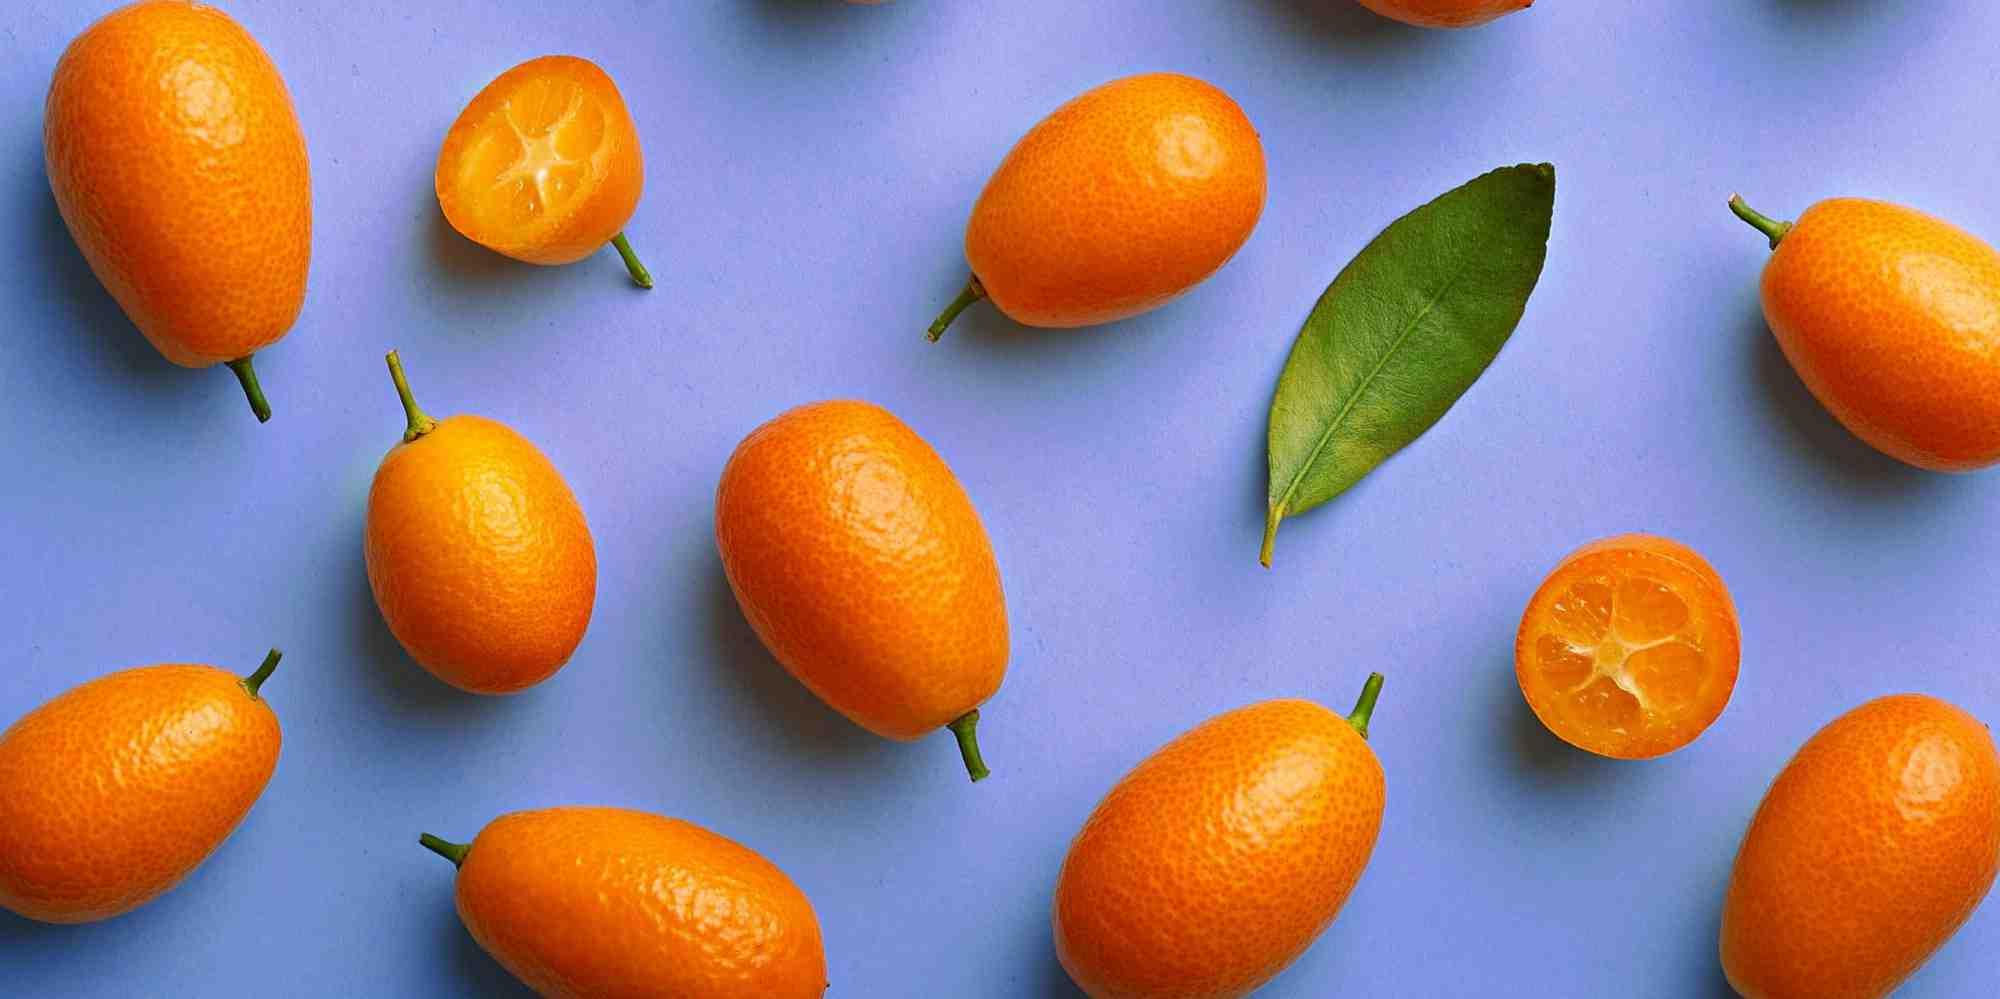 Comment manger un kumquat